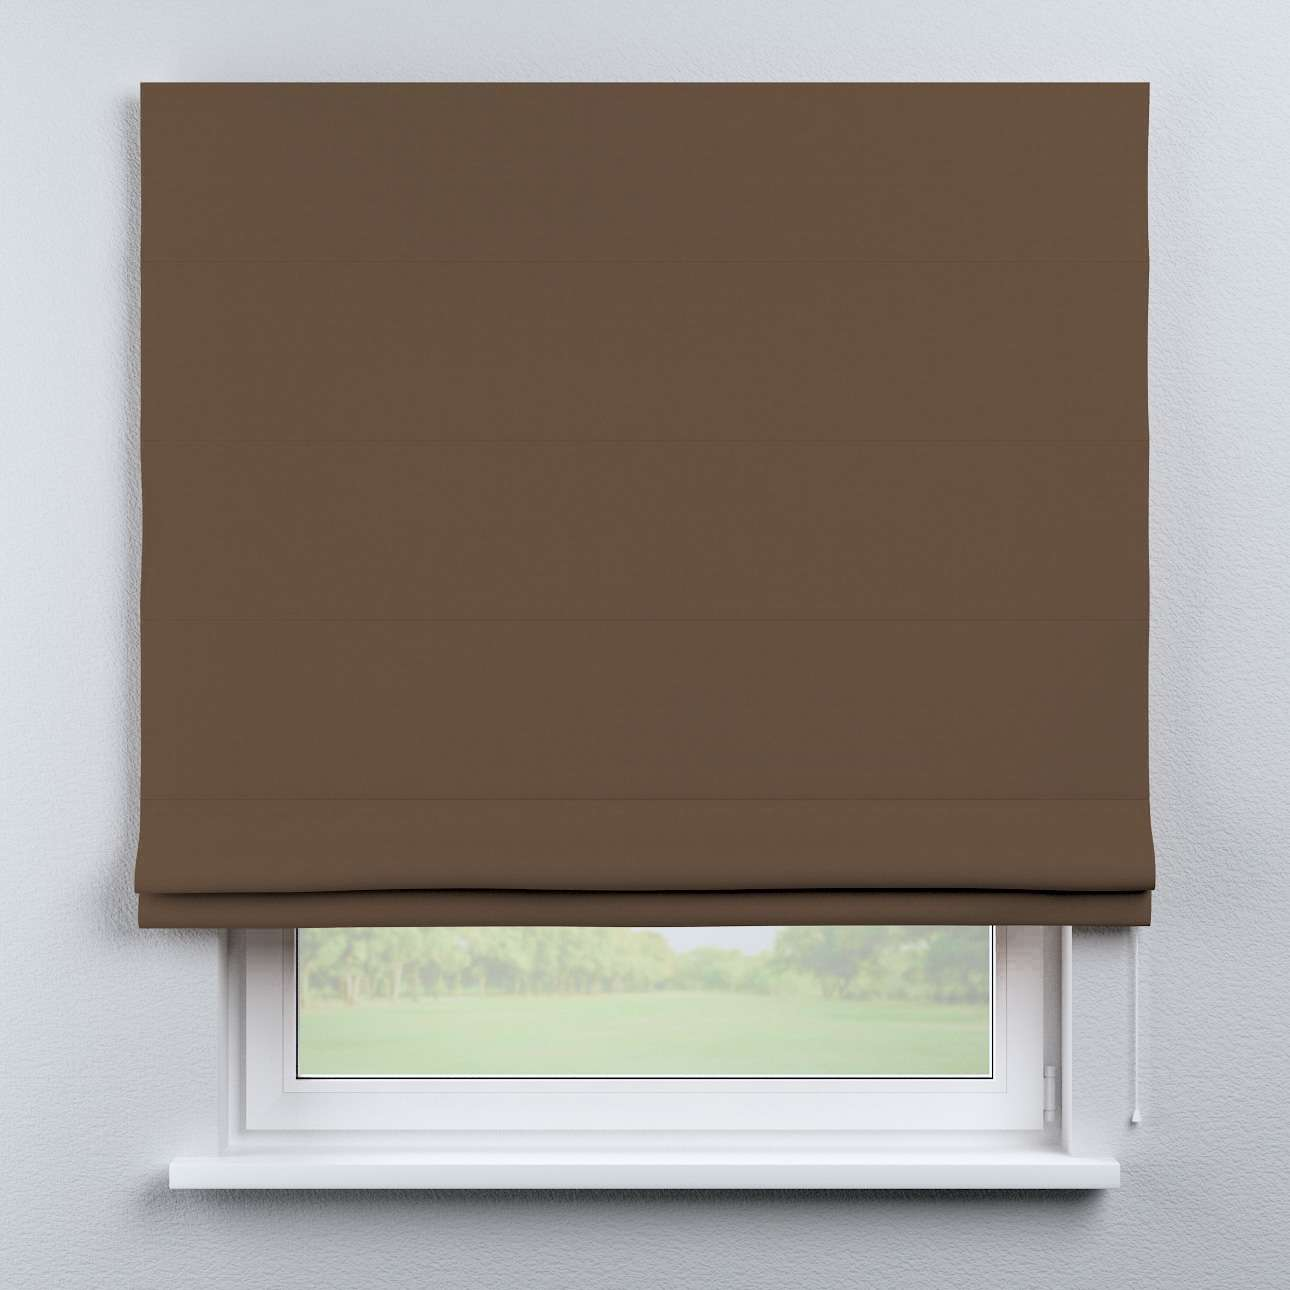 Raffrollo Capri 80 x 170 cm von der Kollektion Cotton Panama, Stoff: 702-02